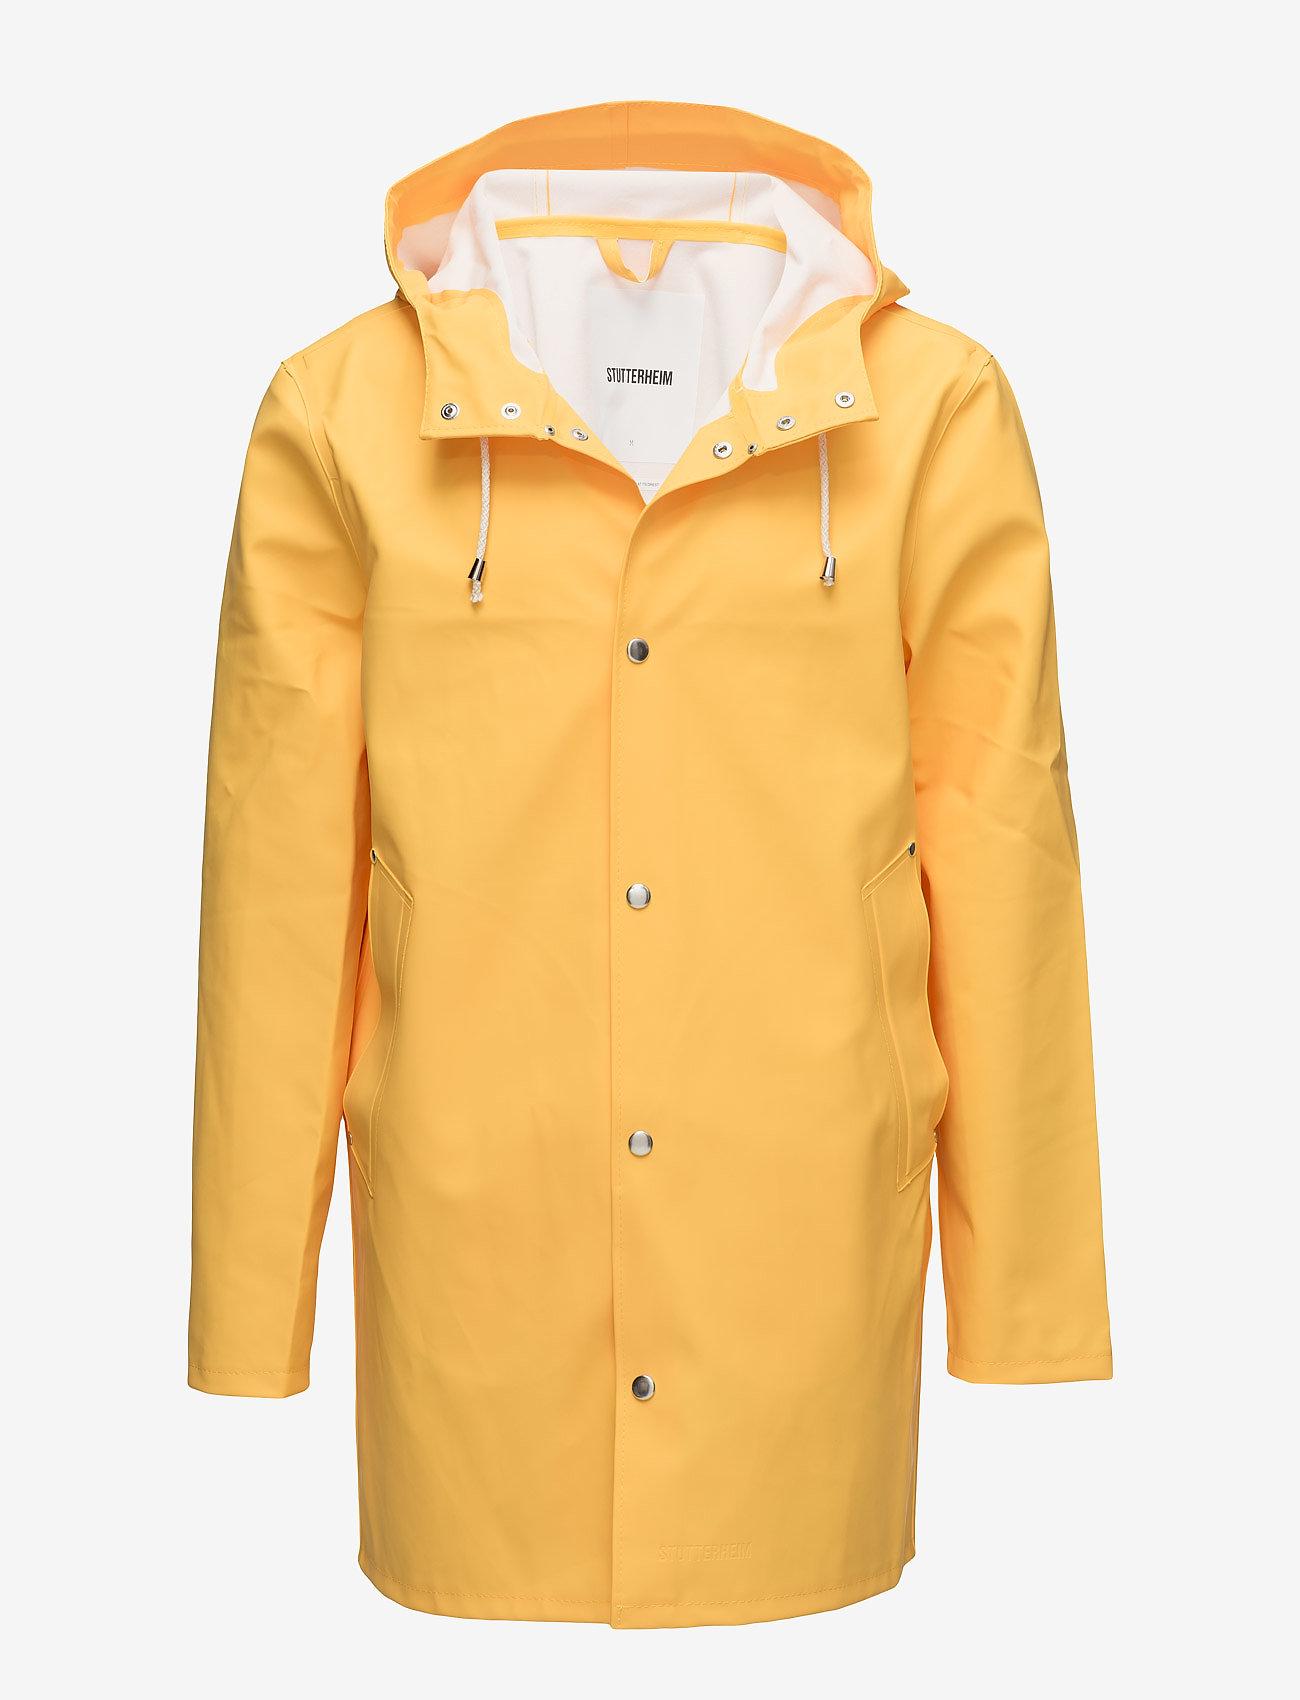 Stutterheim - Stockholm - rainwear - yellow - 0